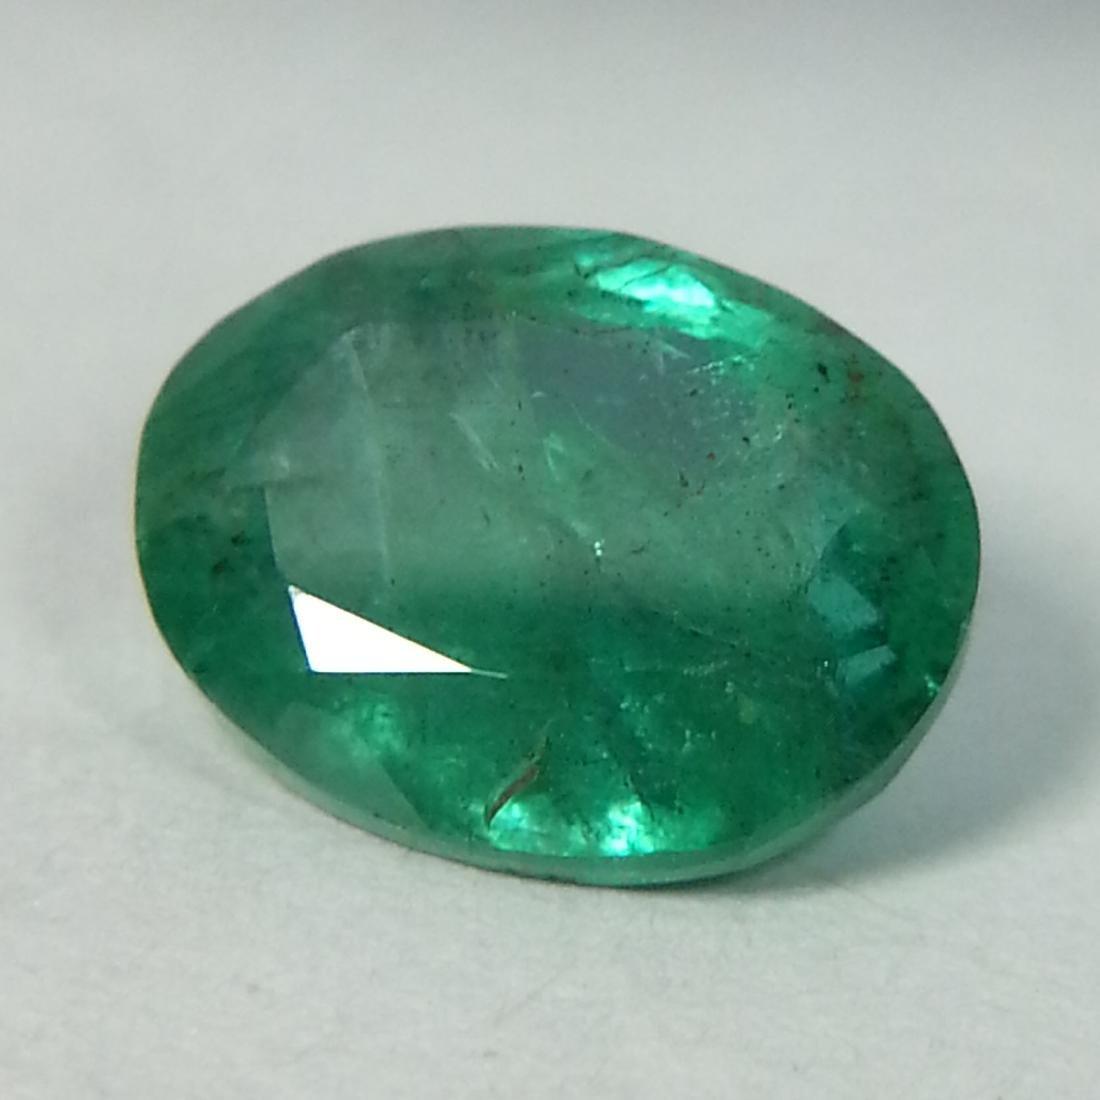 2.42 Carat Loose Emerald